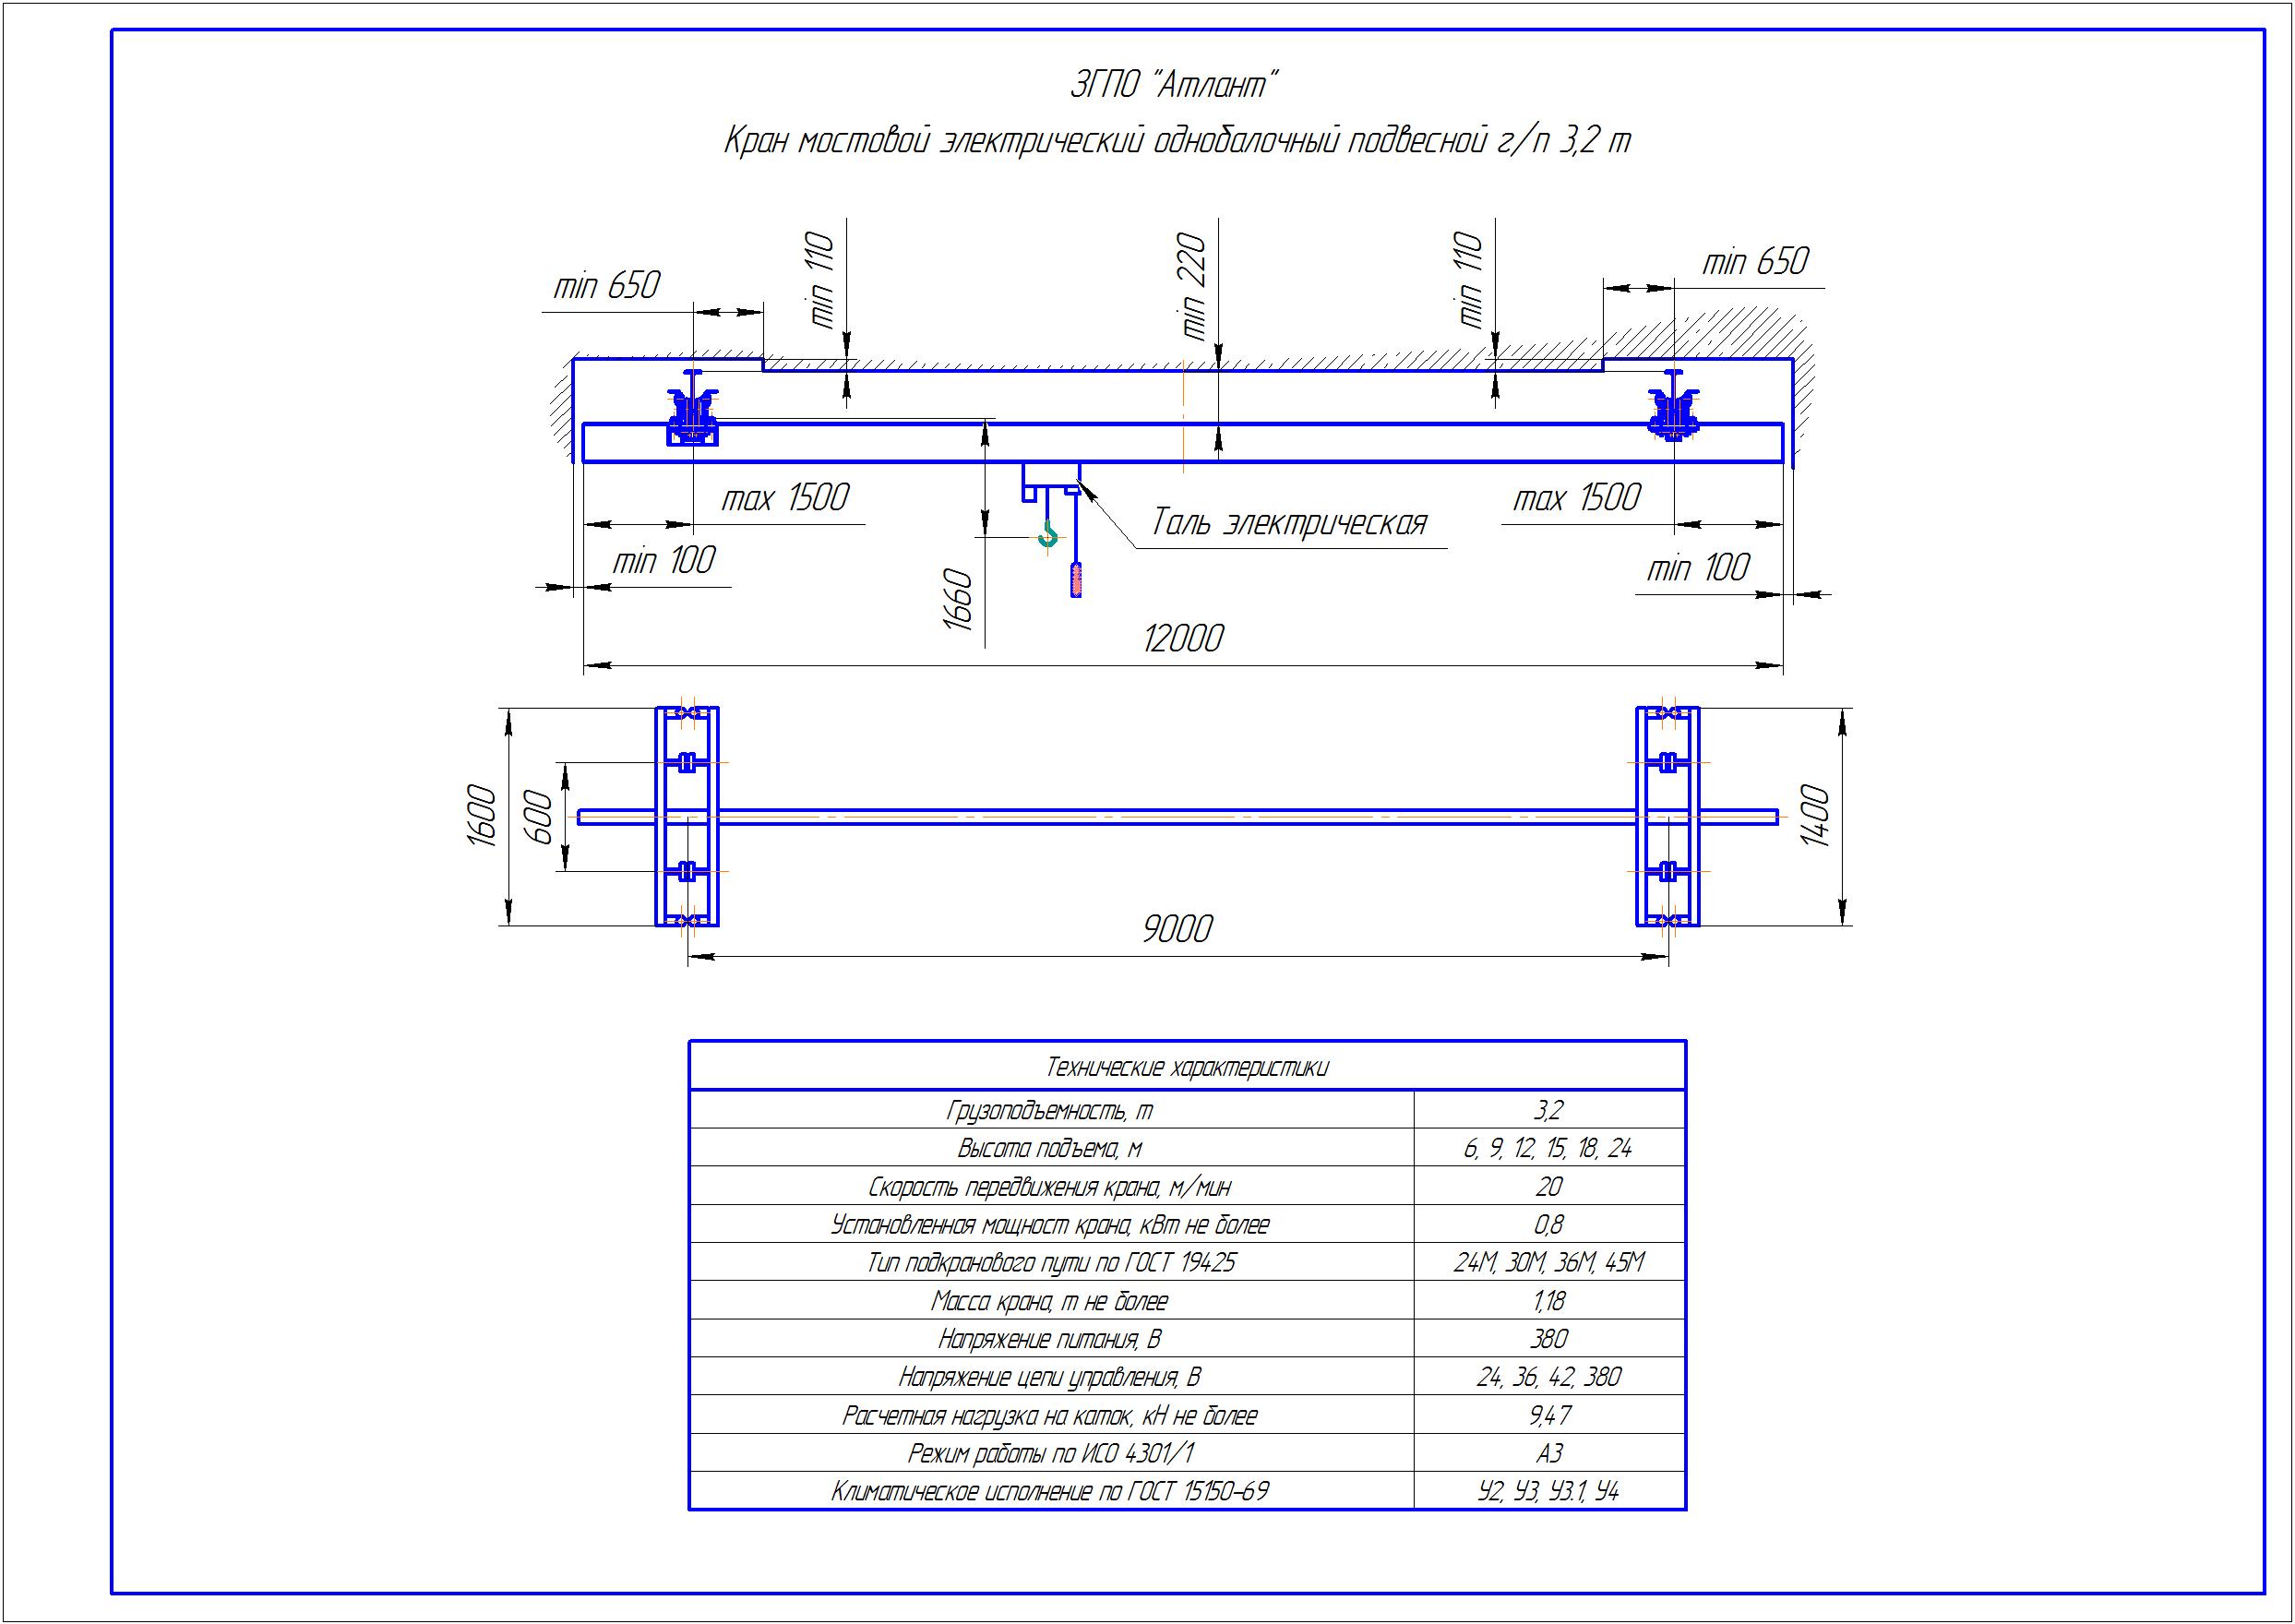 KBP 3 3 - Подвесная кран балка